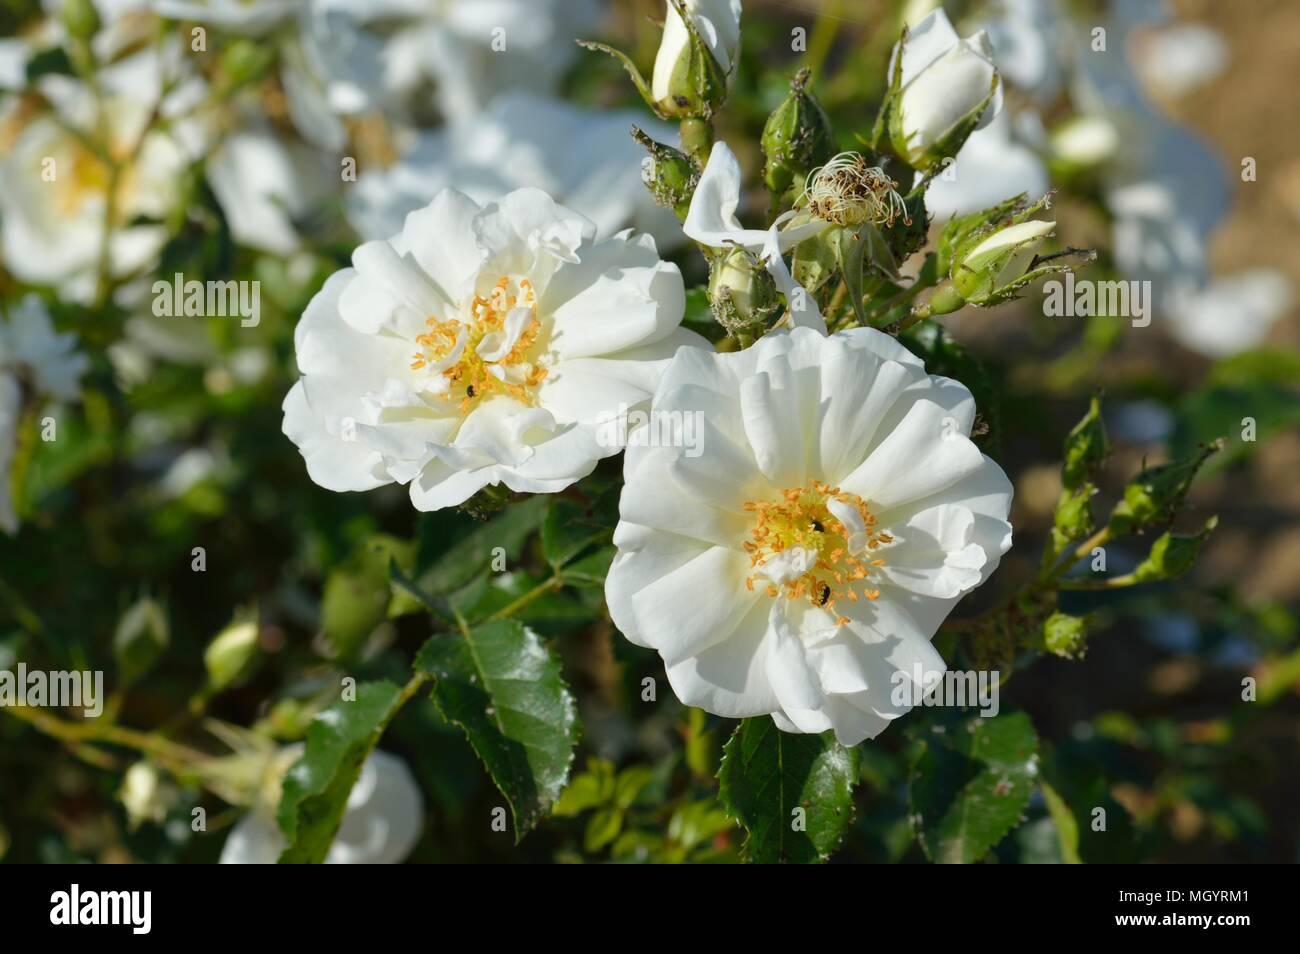 Rose Flower Carpet White Stock Photo 182549473 Alamy